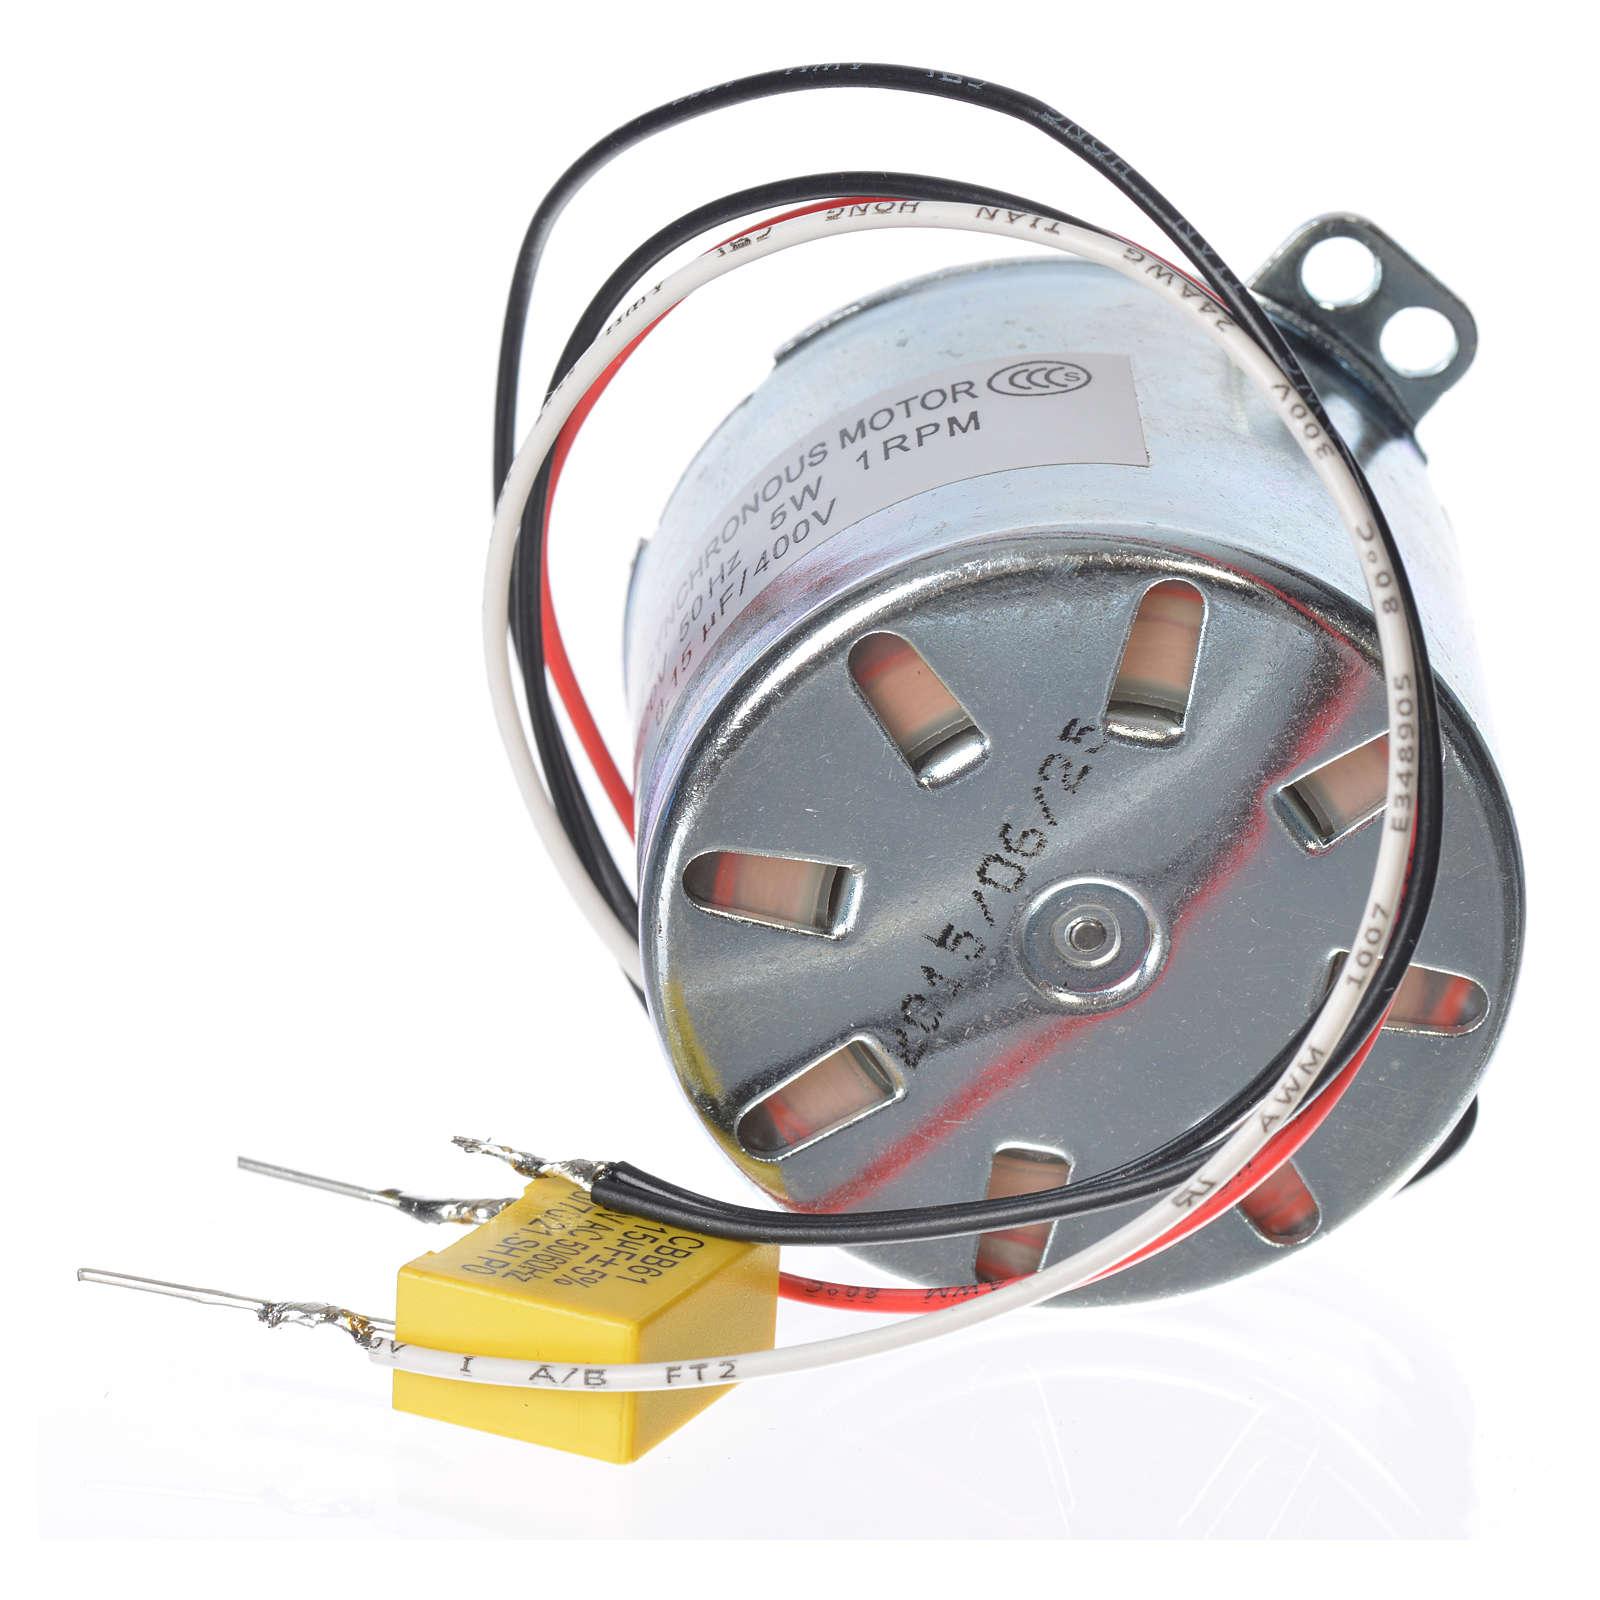 Motoriduttore MV 1 giro/min presepe 4